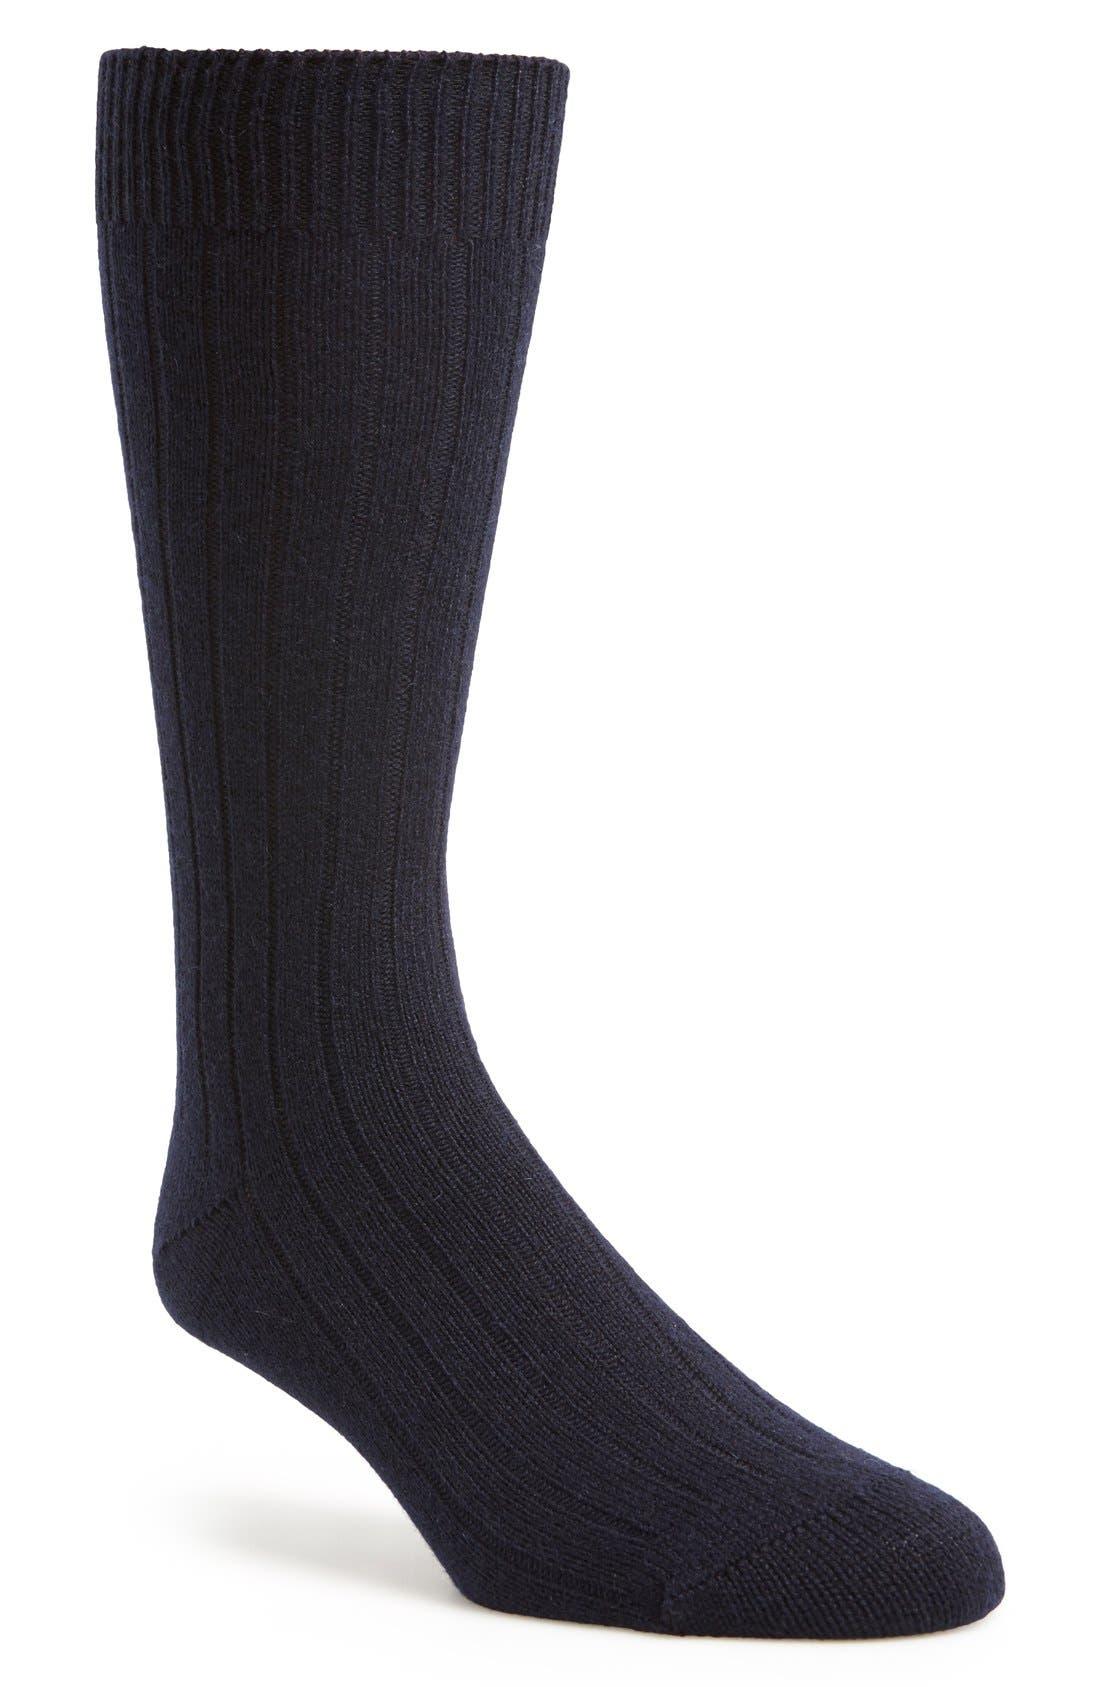 Main Image - Pantherella 'Waddington' Cashmere Blend Mid Calf Socks